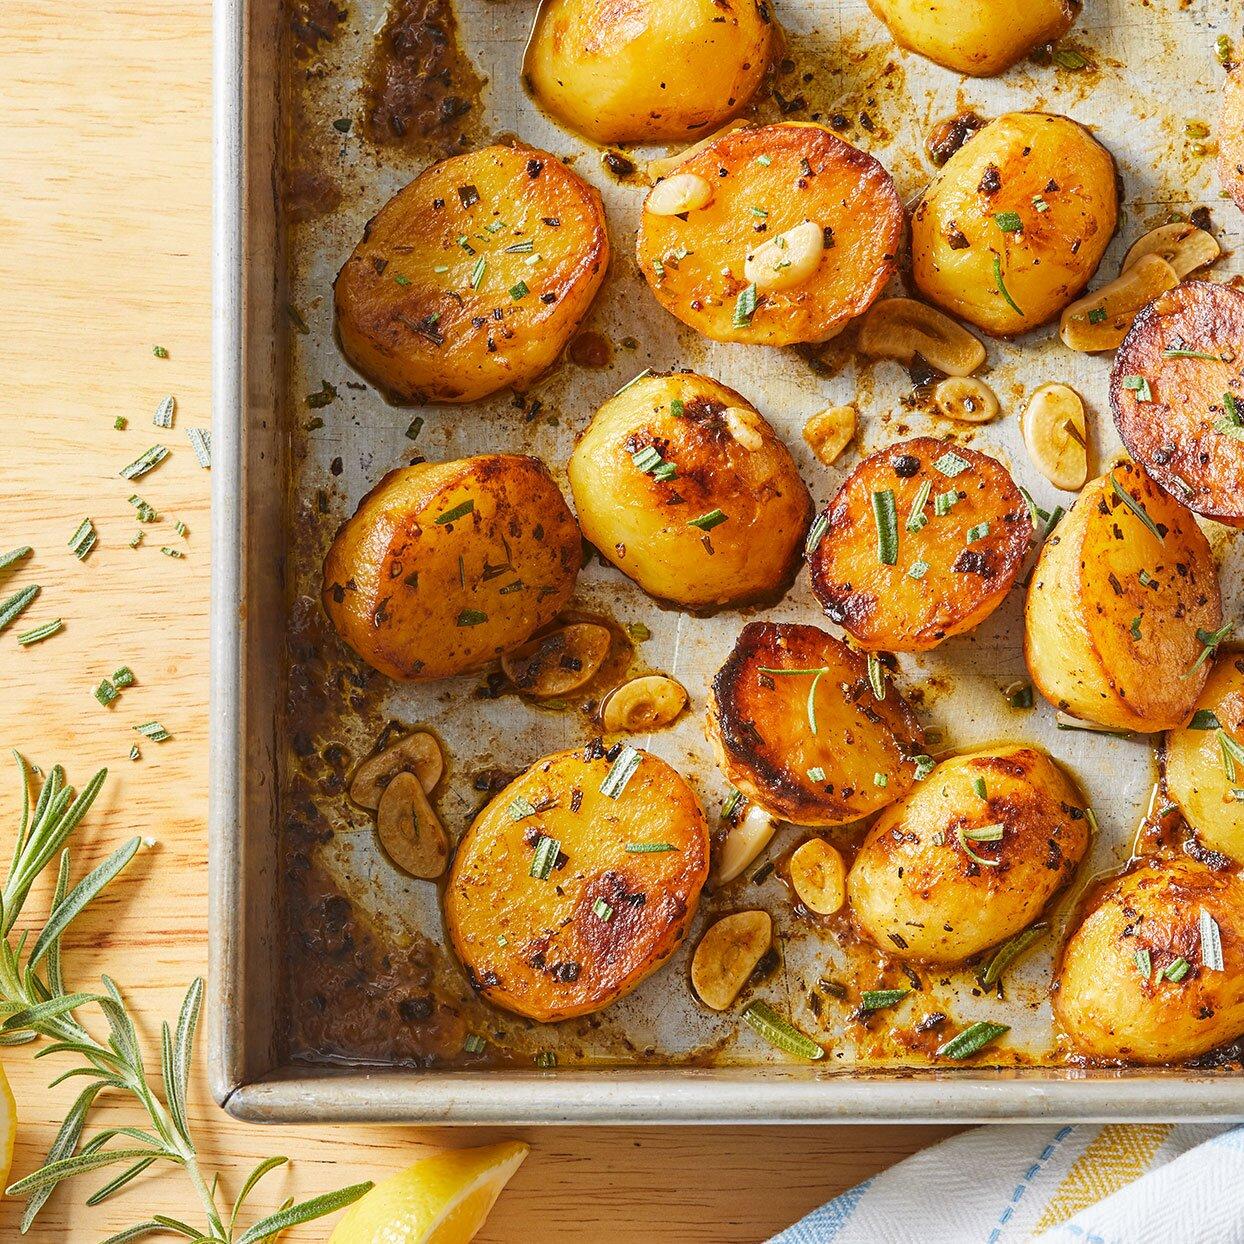 Lemon-Rosemary Melting Potatoes